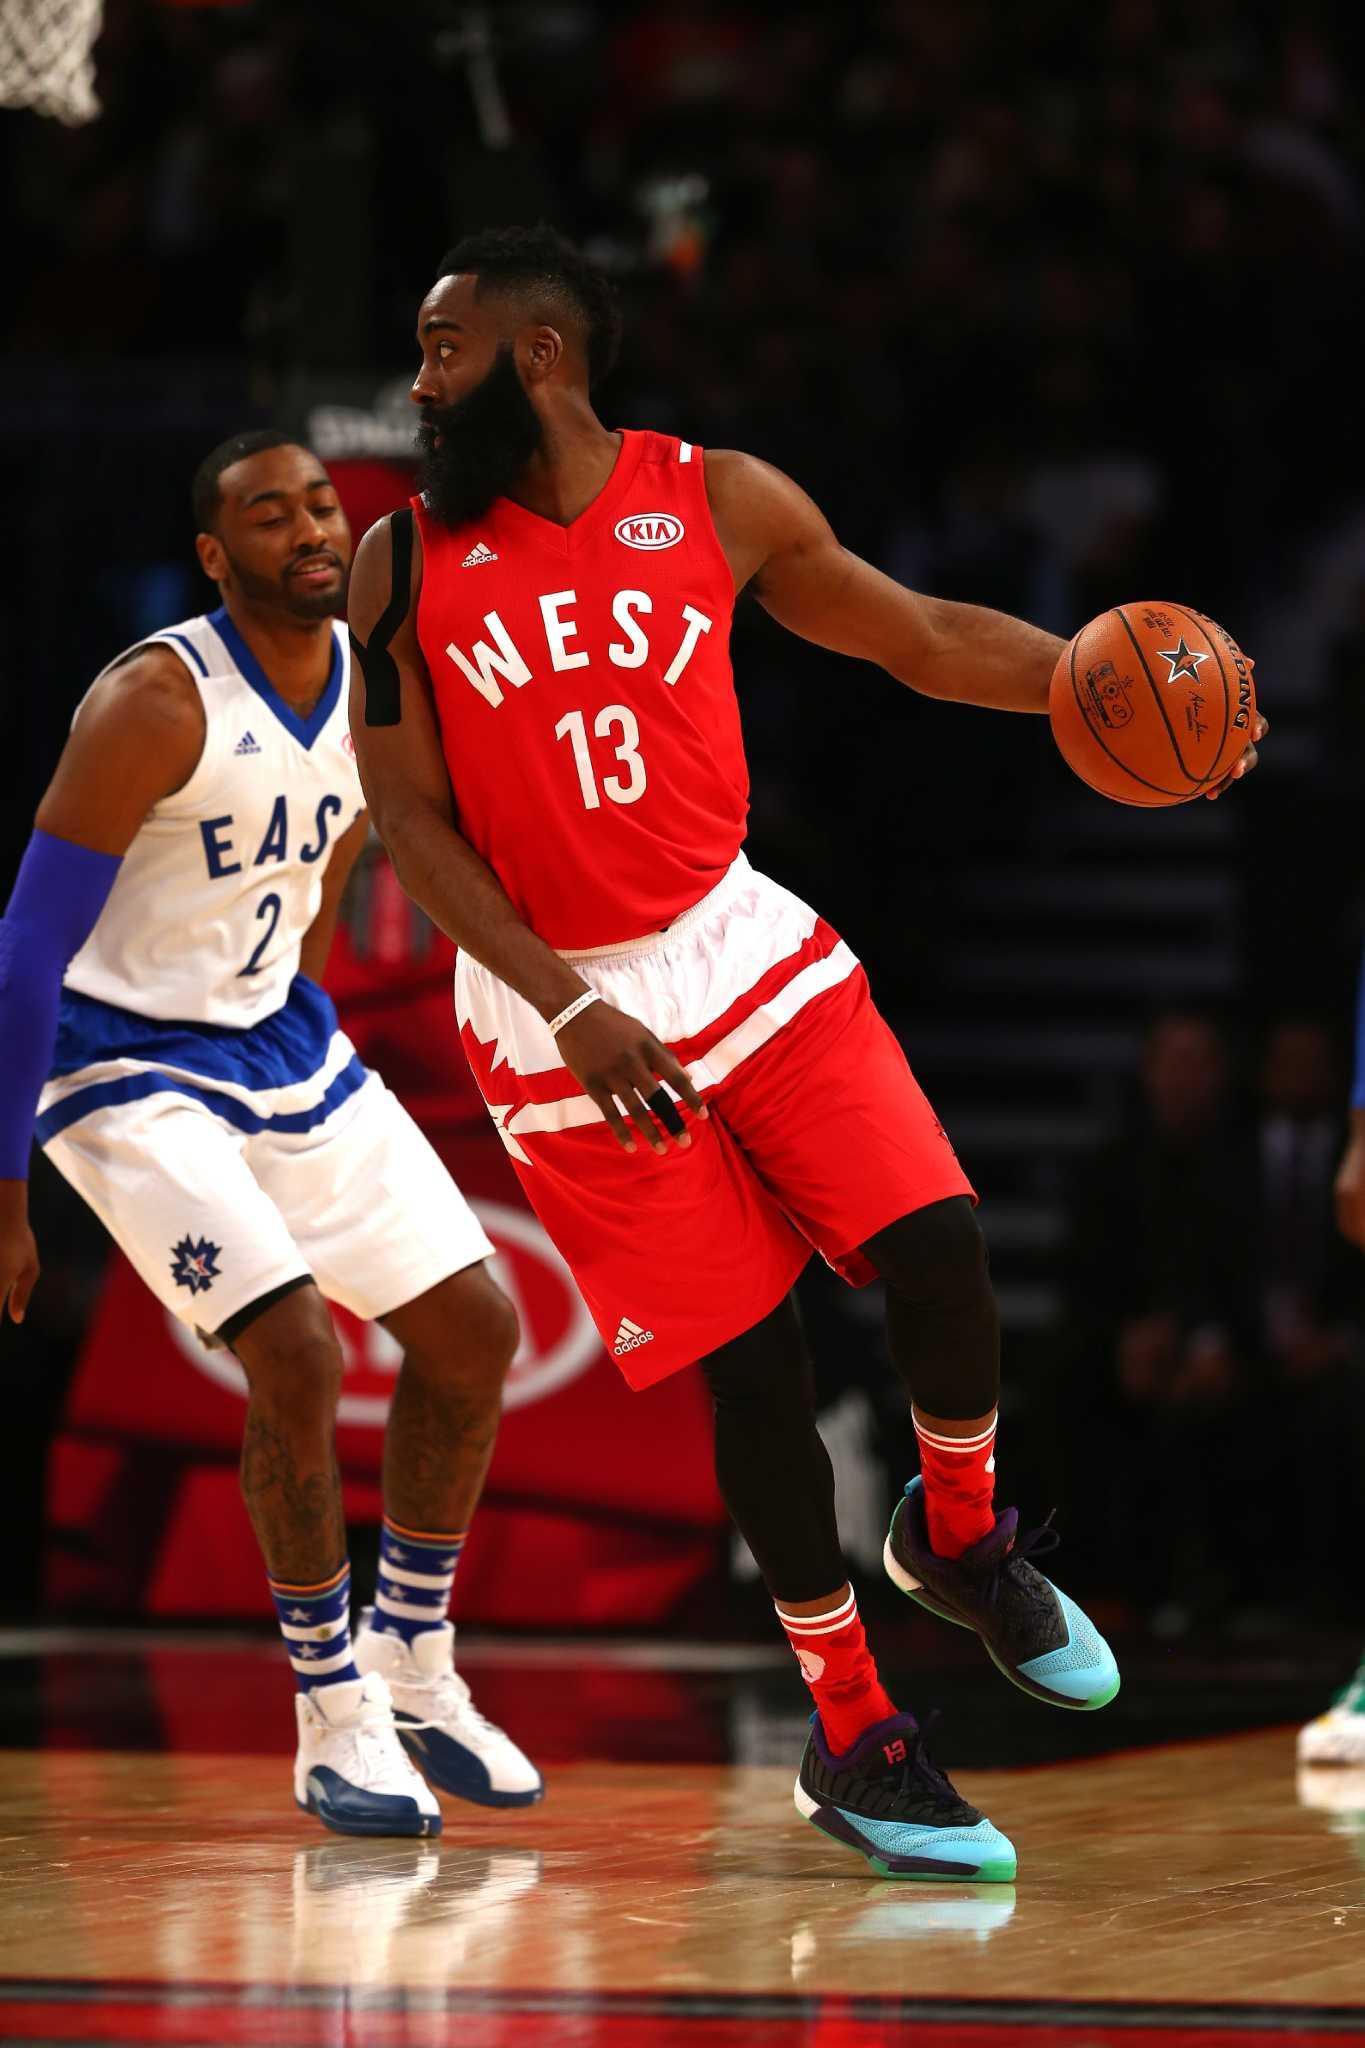 90341c45b3f Rockets preparing bid to host future NBA All-Star game - San Antonio  Express-News